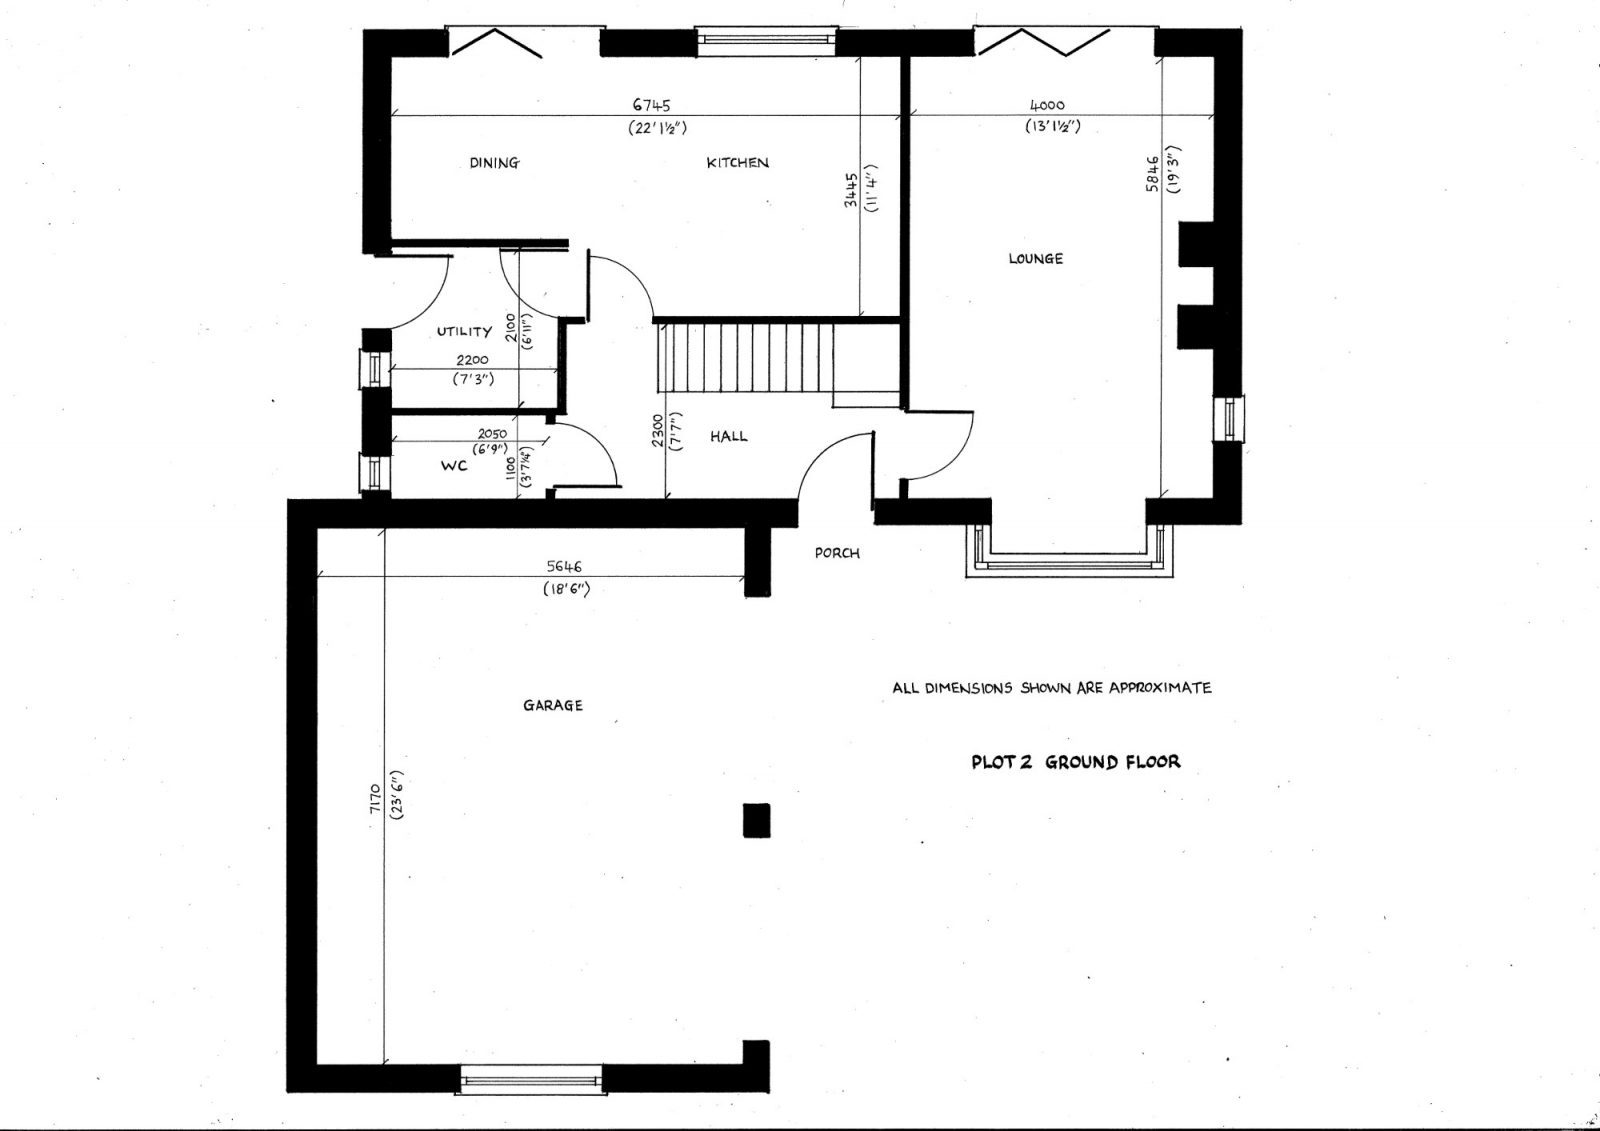 plot-2-ground-floor-plan-reduced